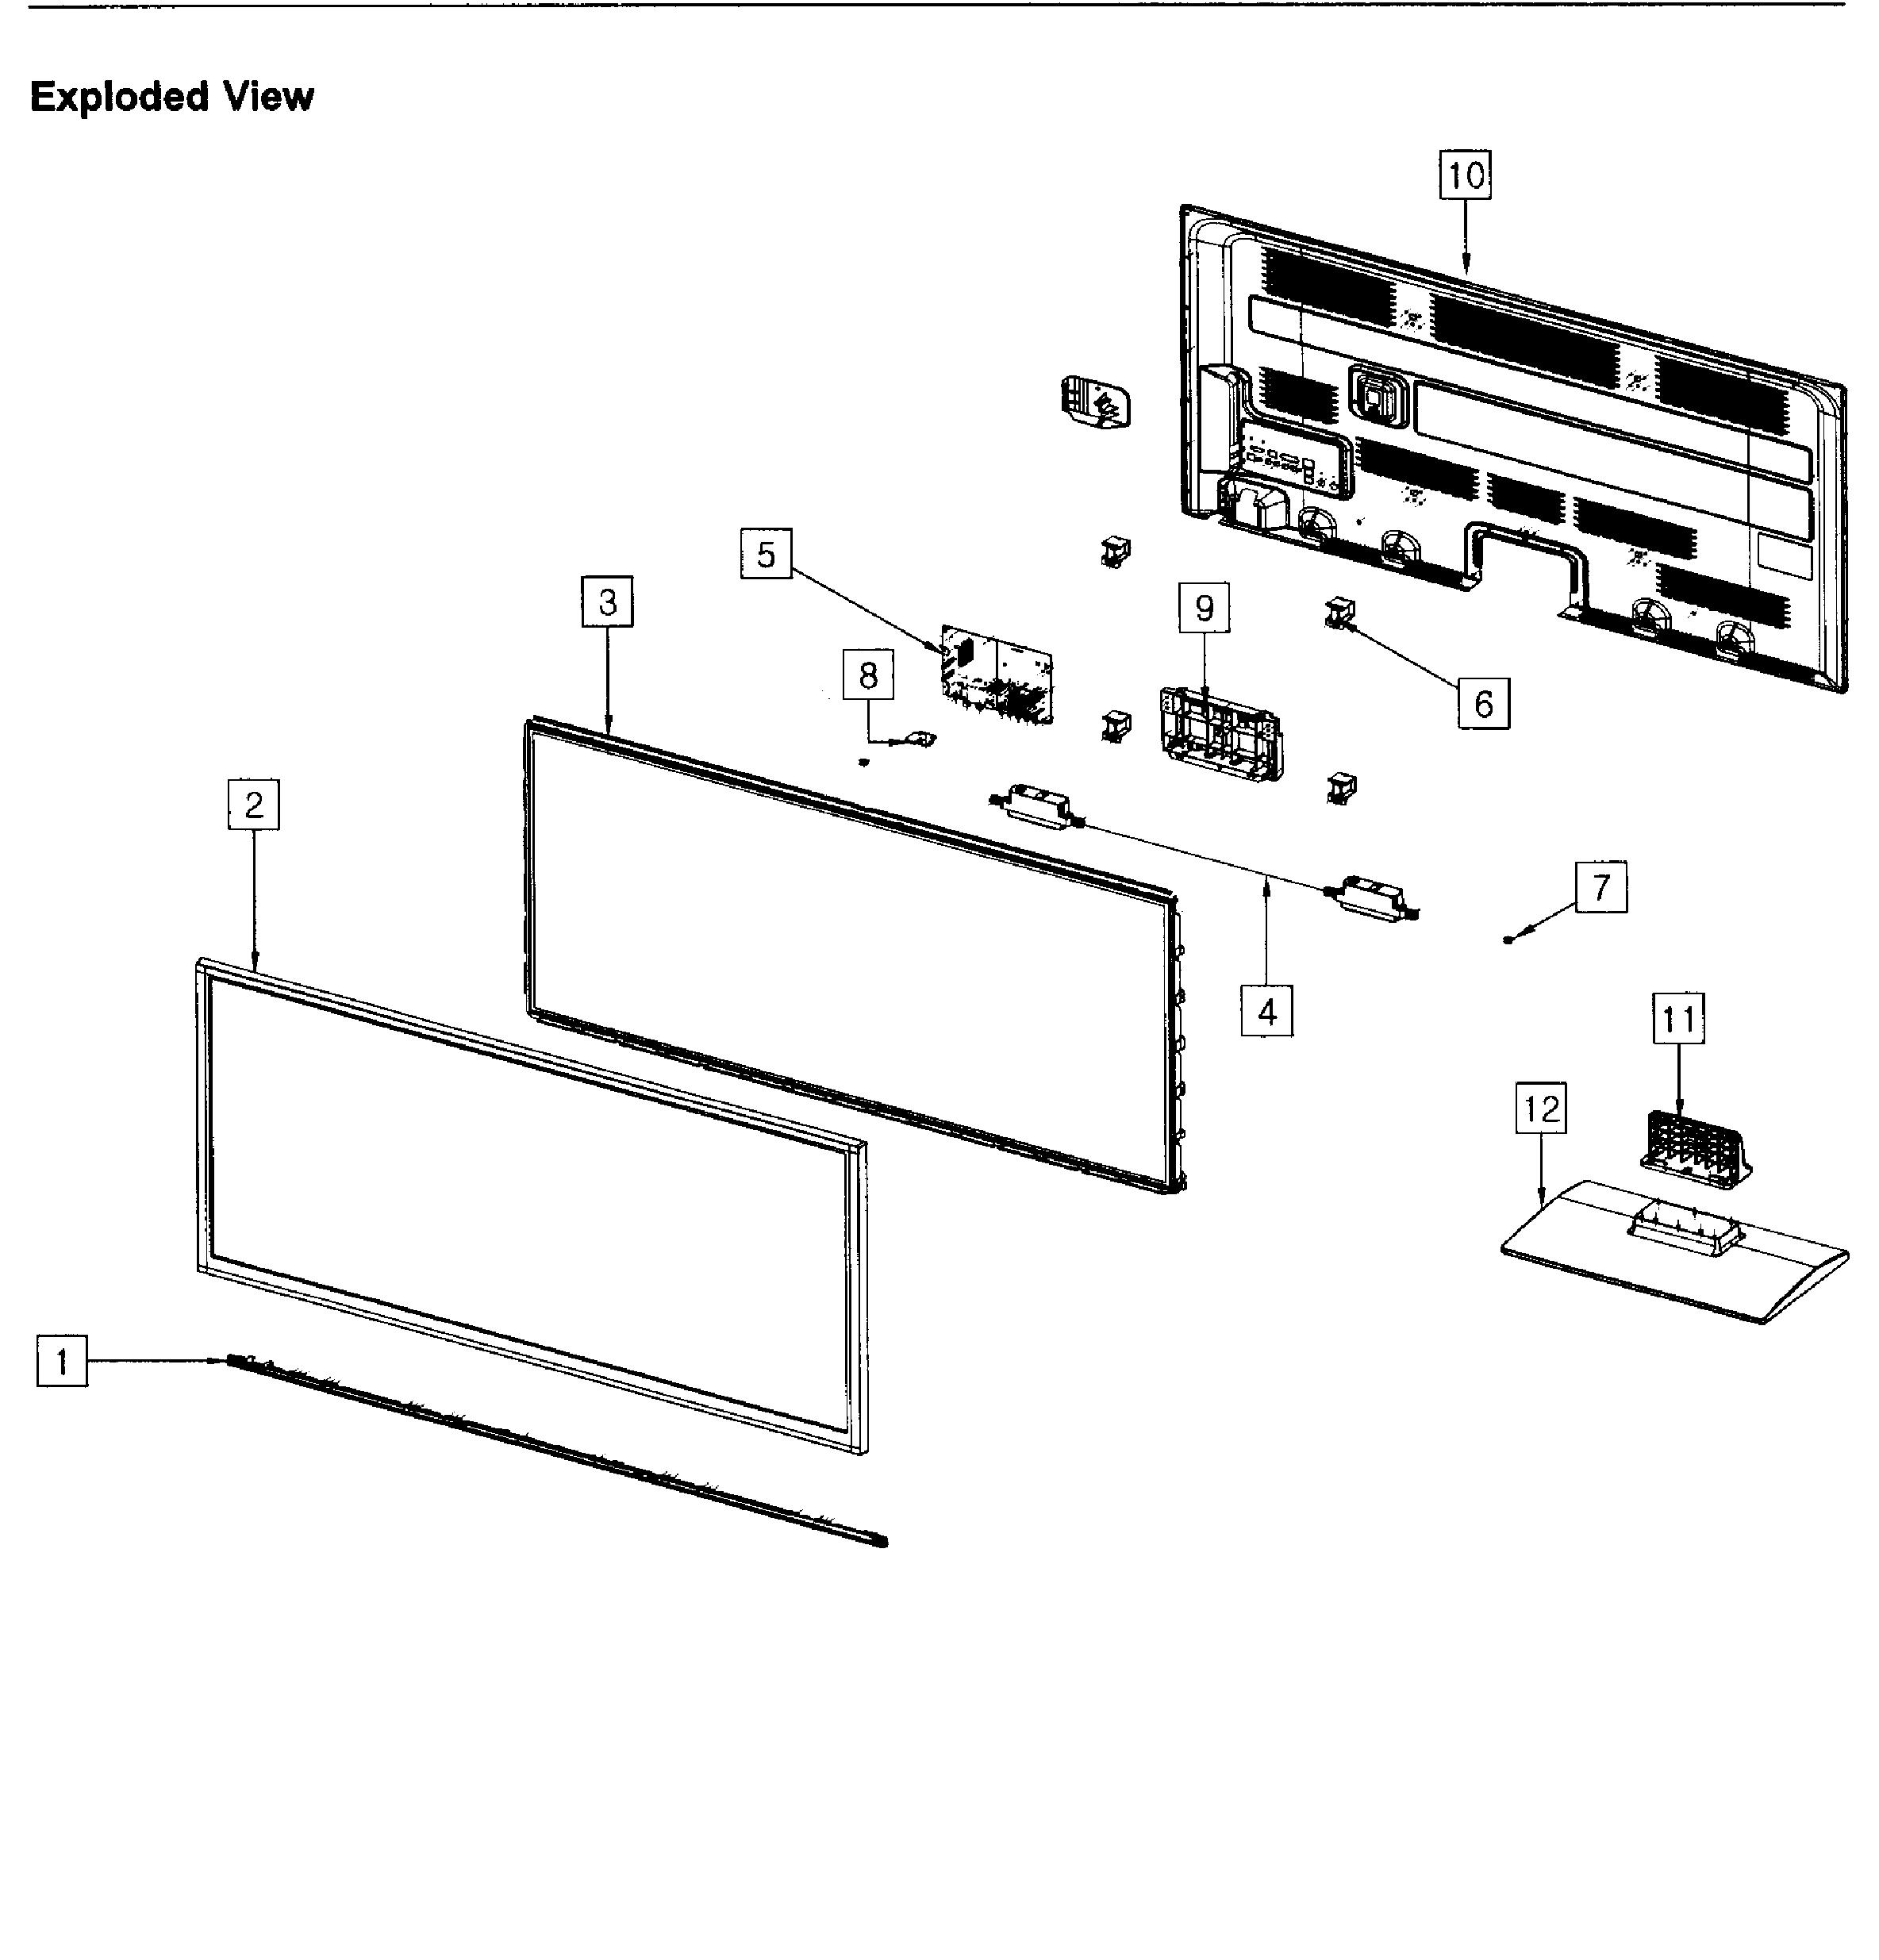 Samsung model PN51E450A1FXZA-TD02 plasma television